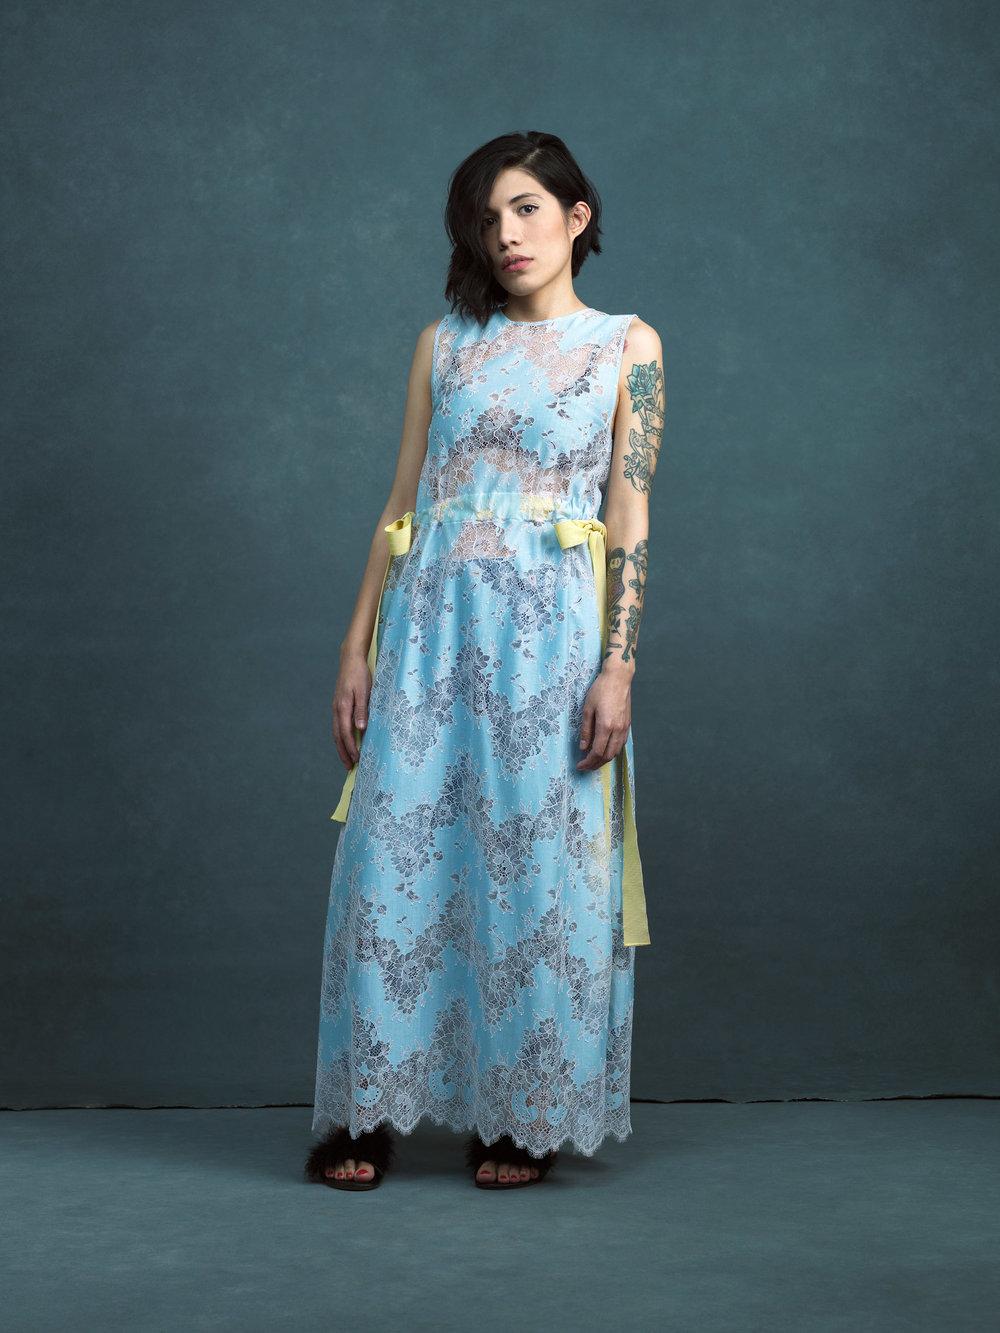 The Unicorn Woman - Silvinaa in the Evanescence Dress.